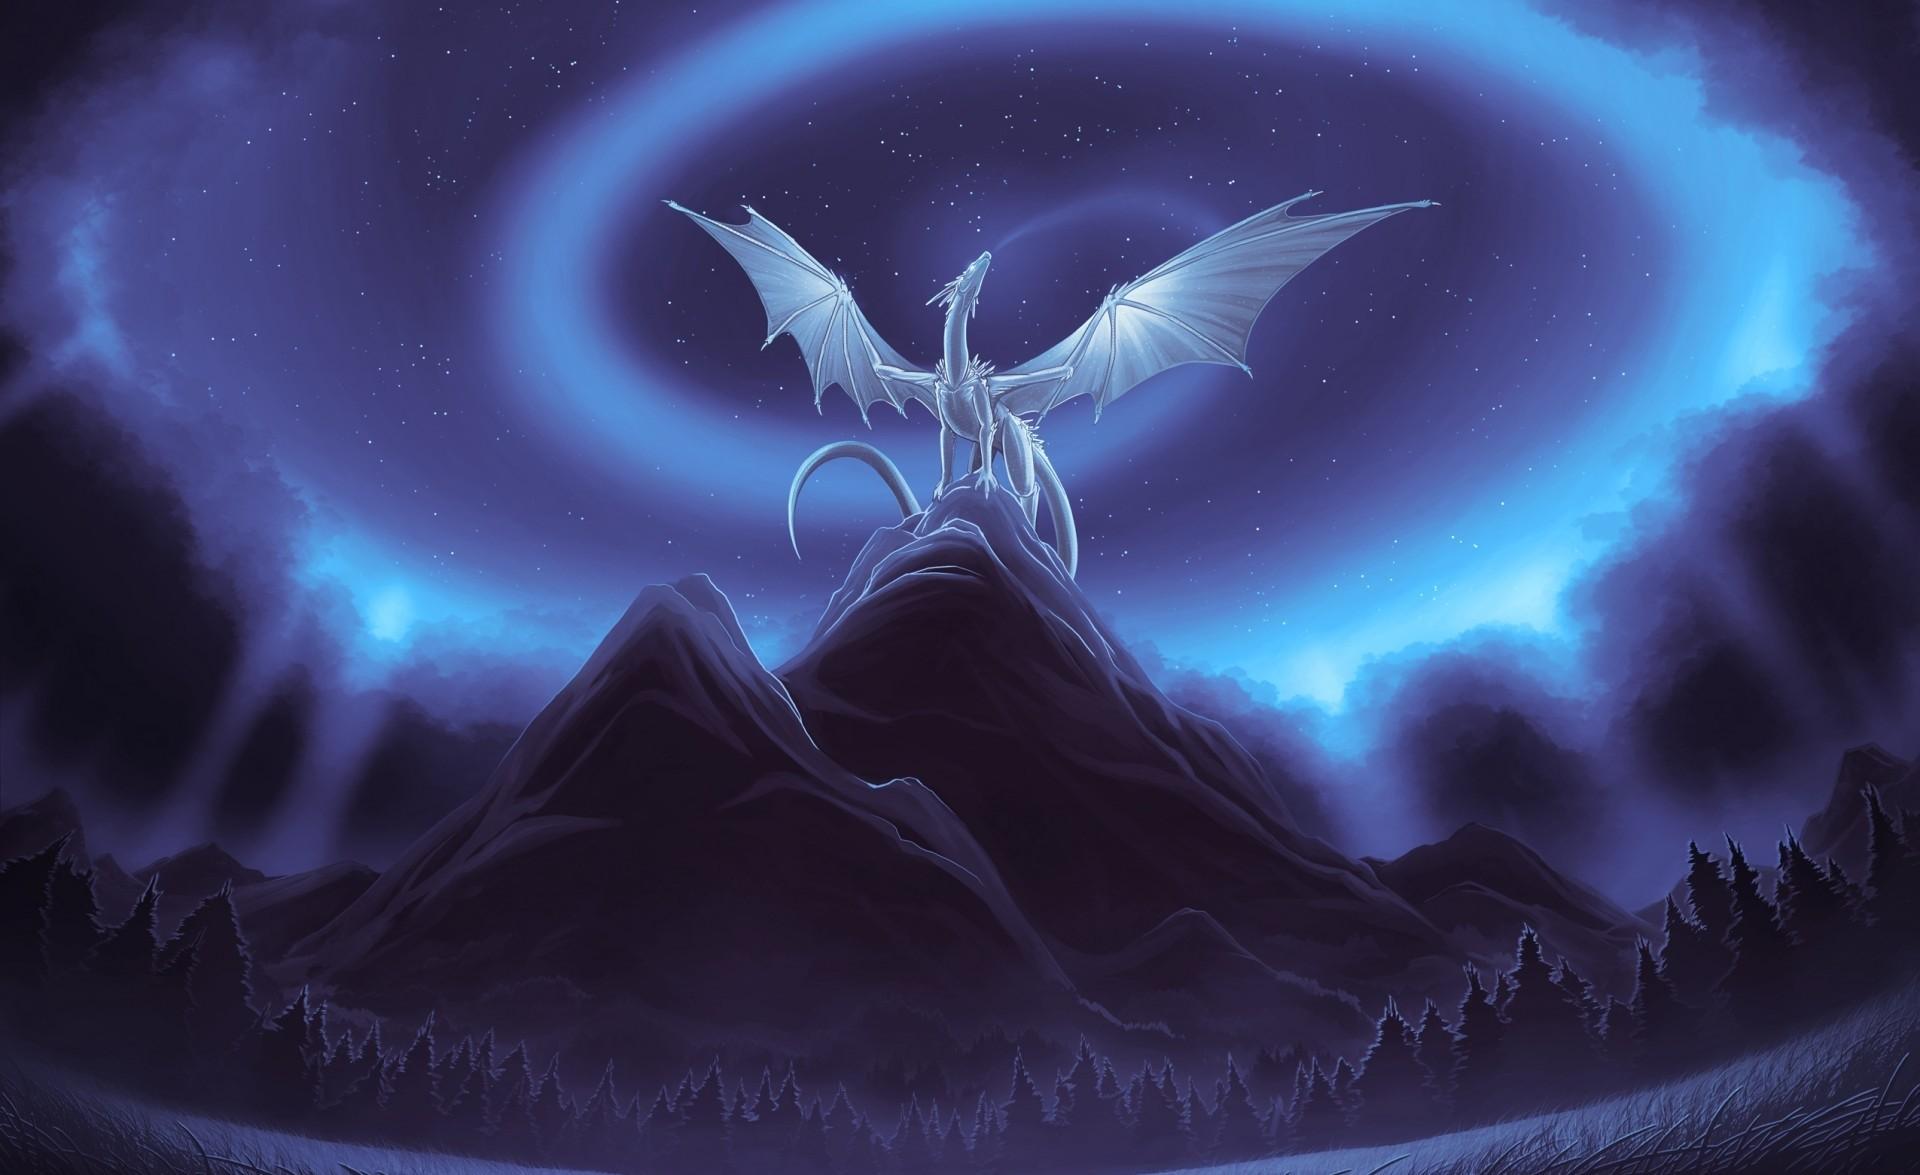 Epic dragon wallpaper dump